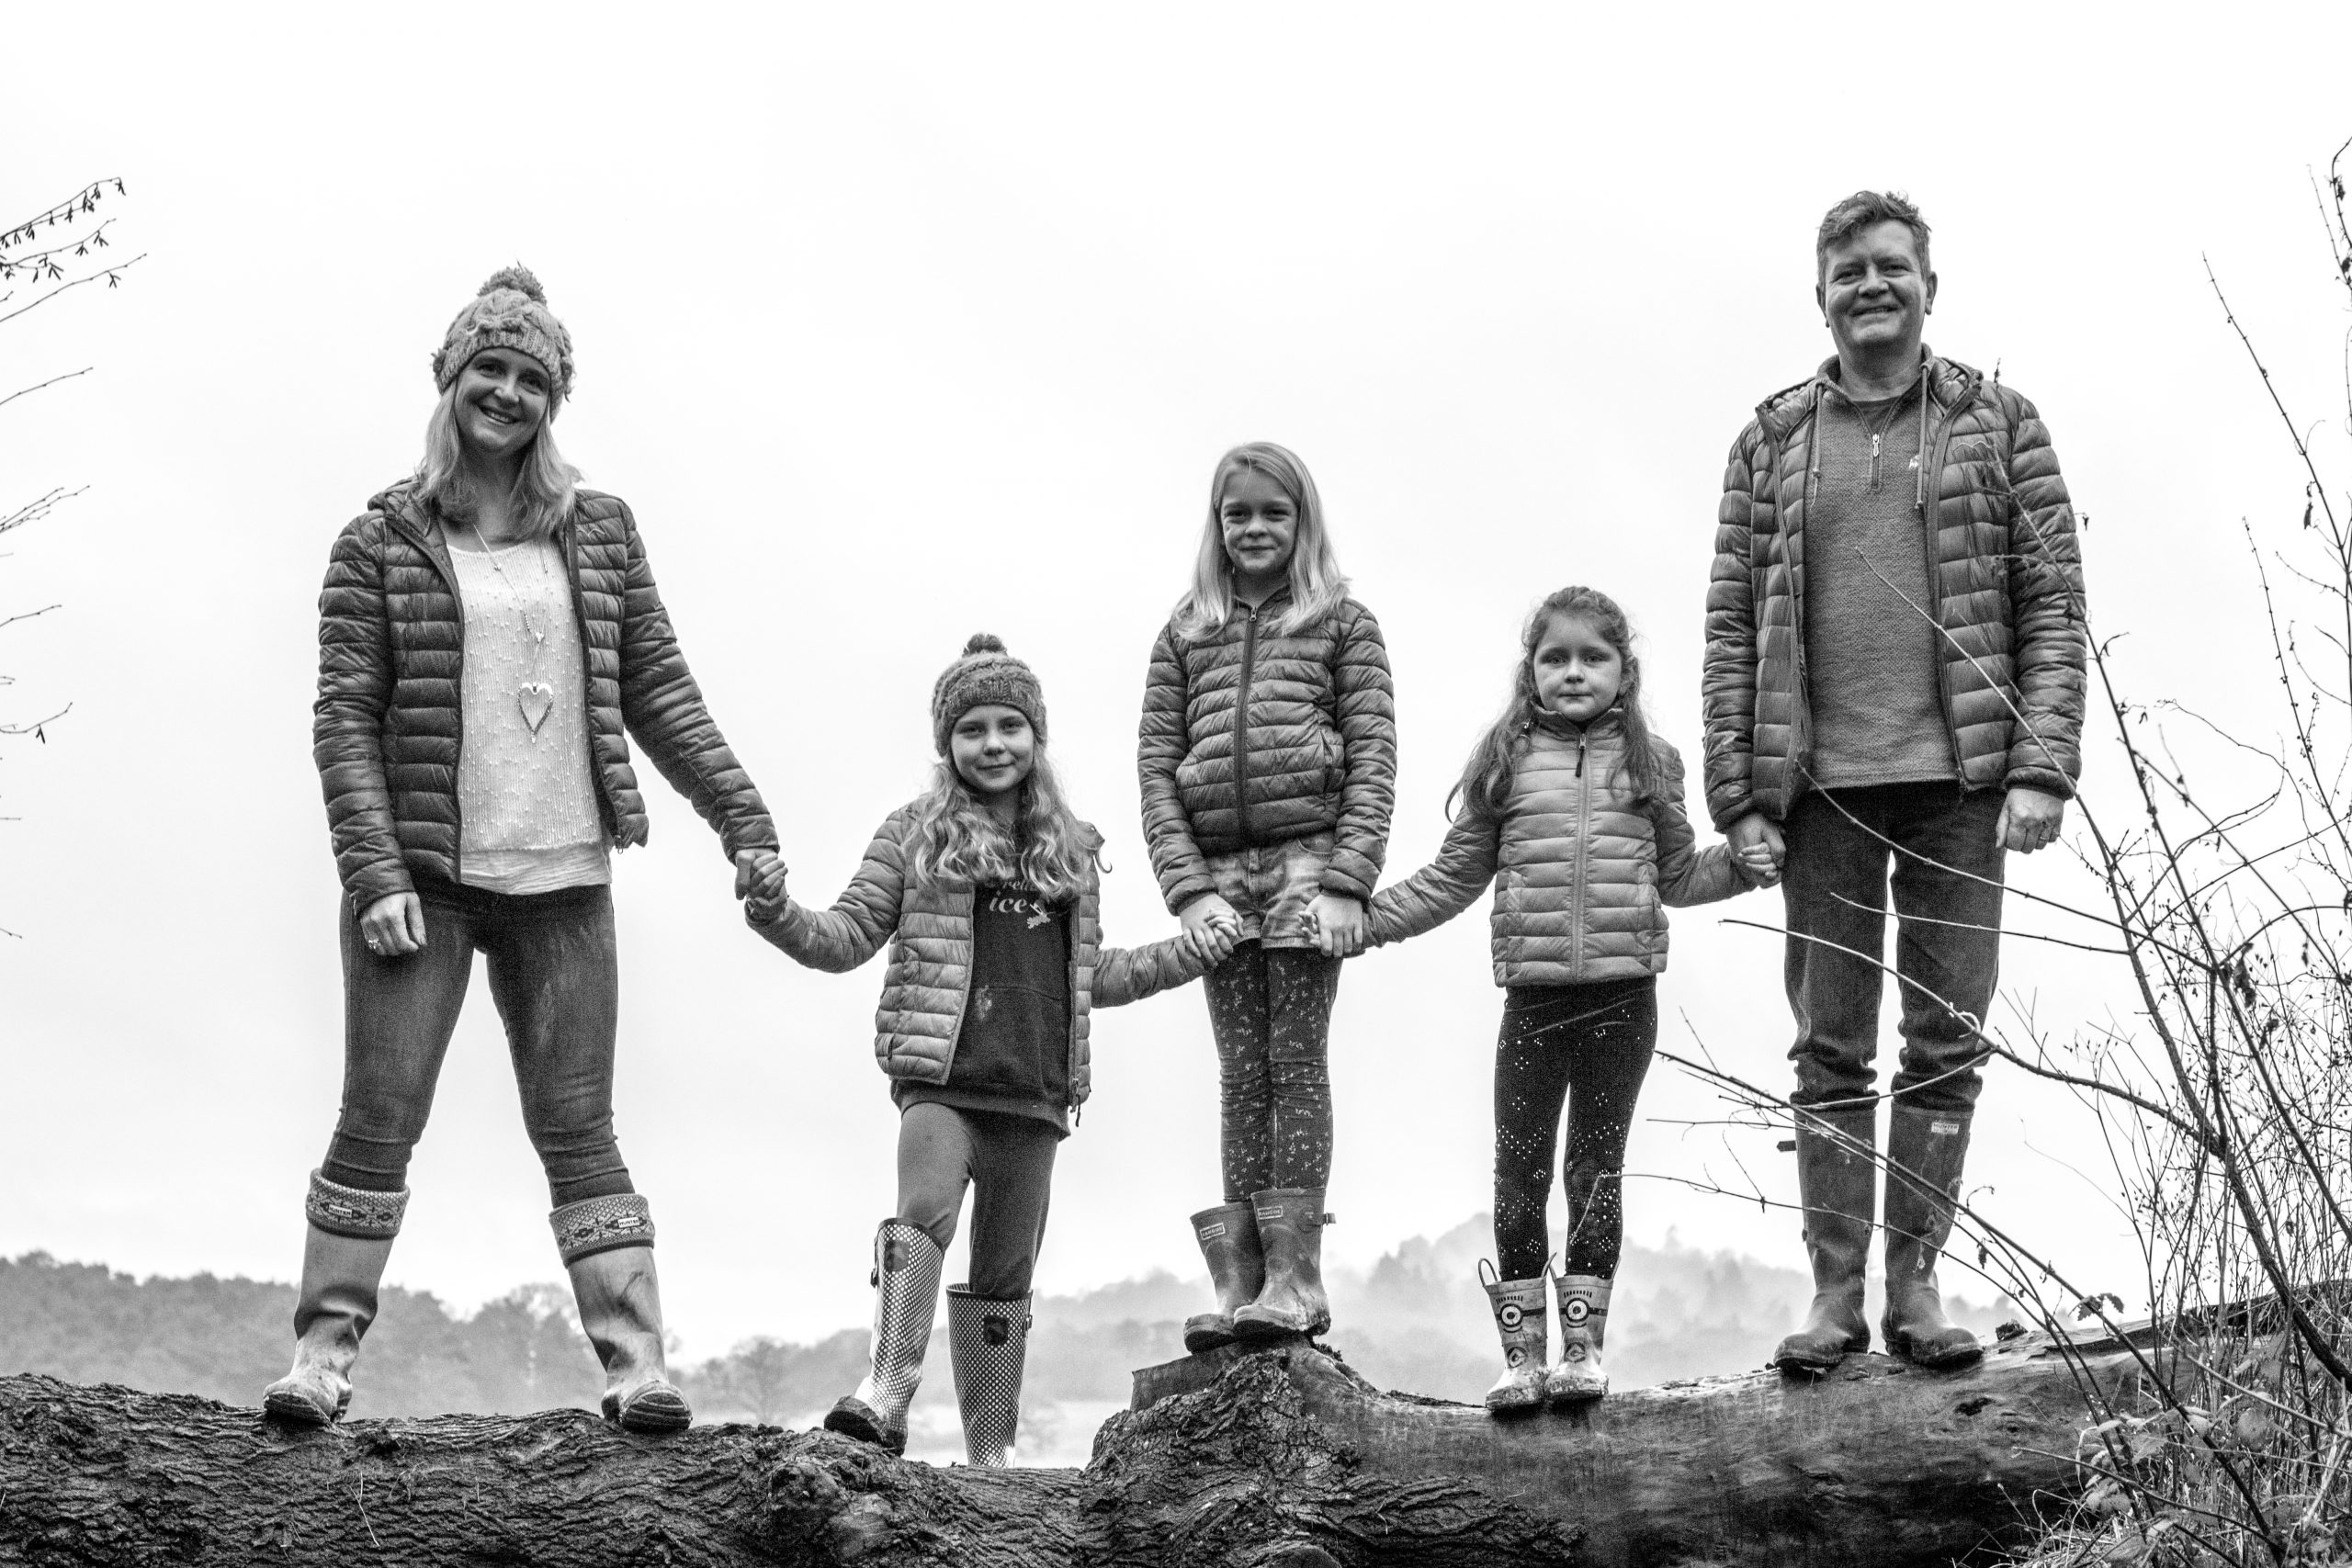 Black and white Winter family photoshoot